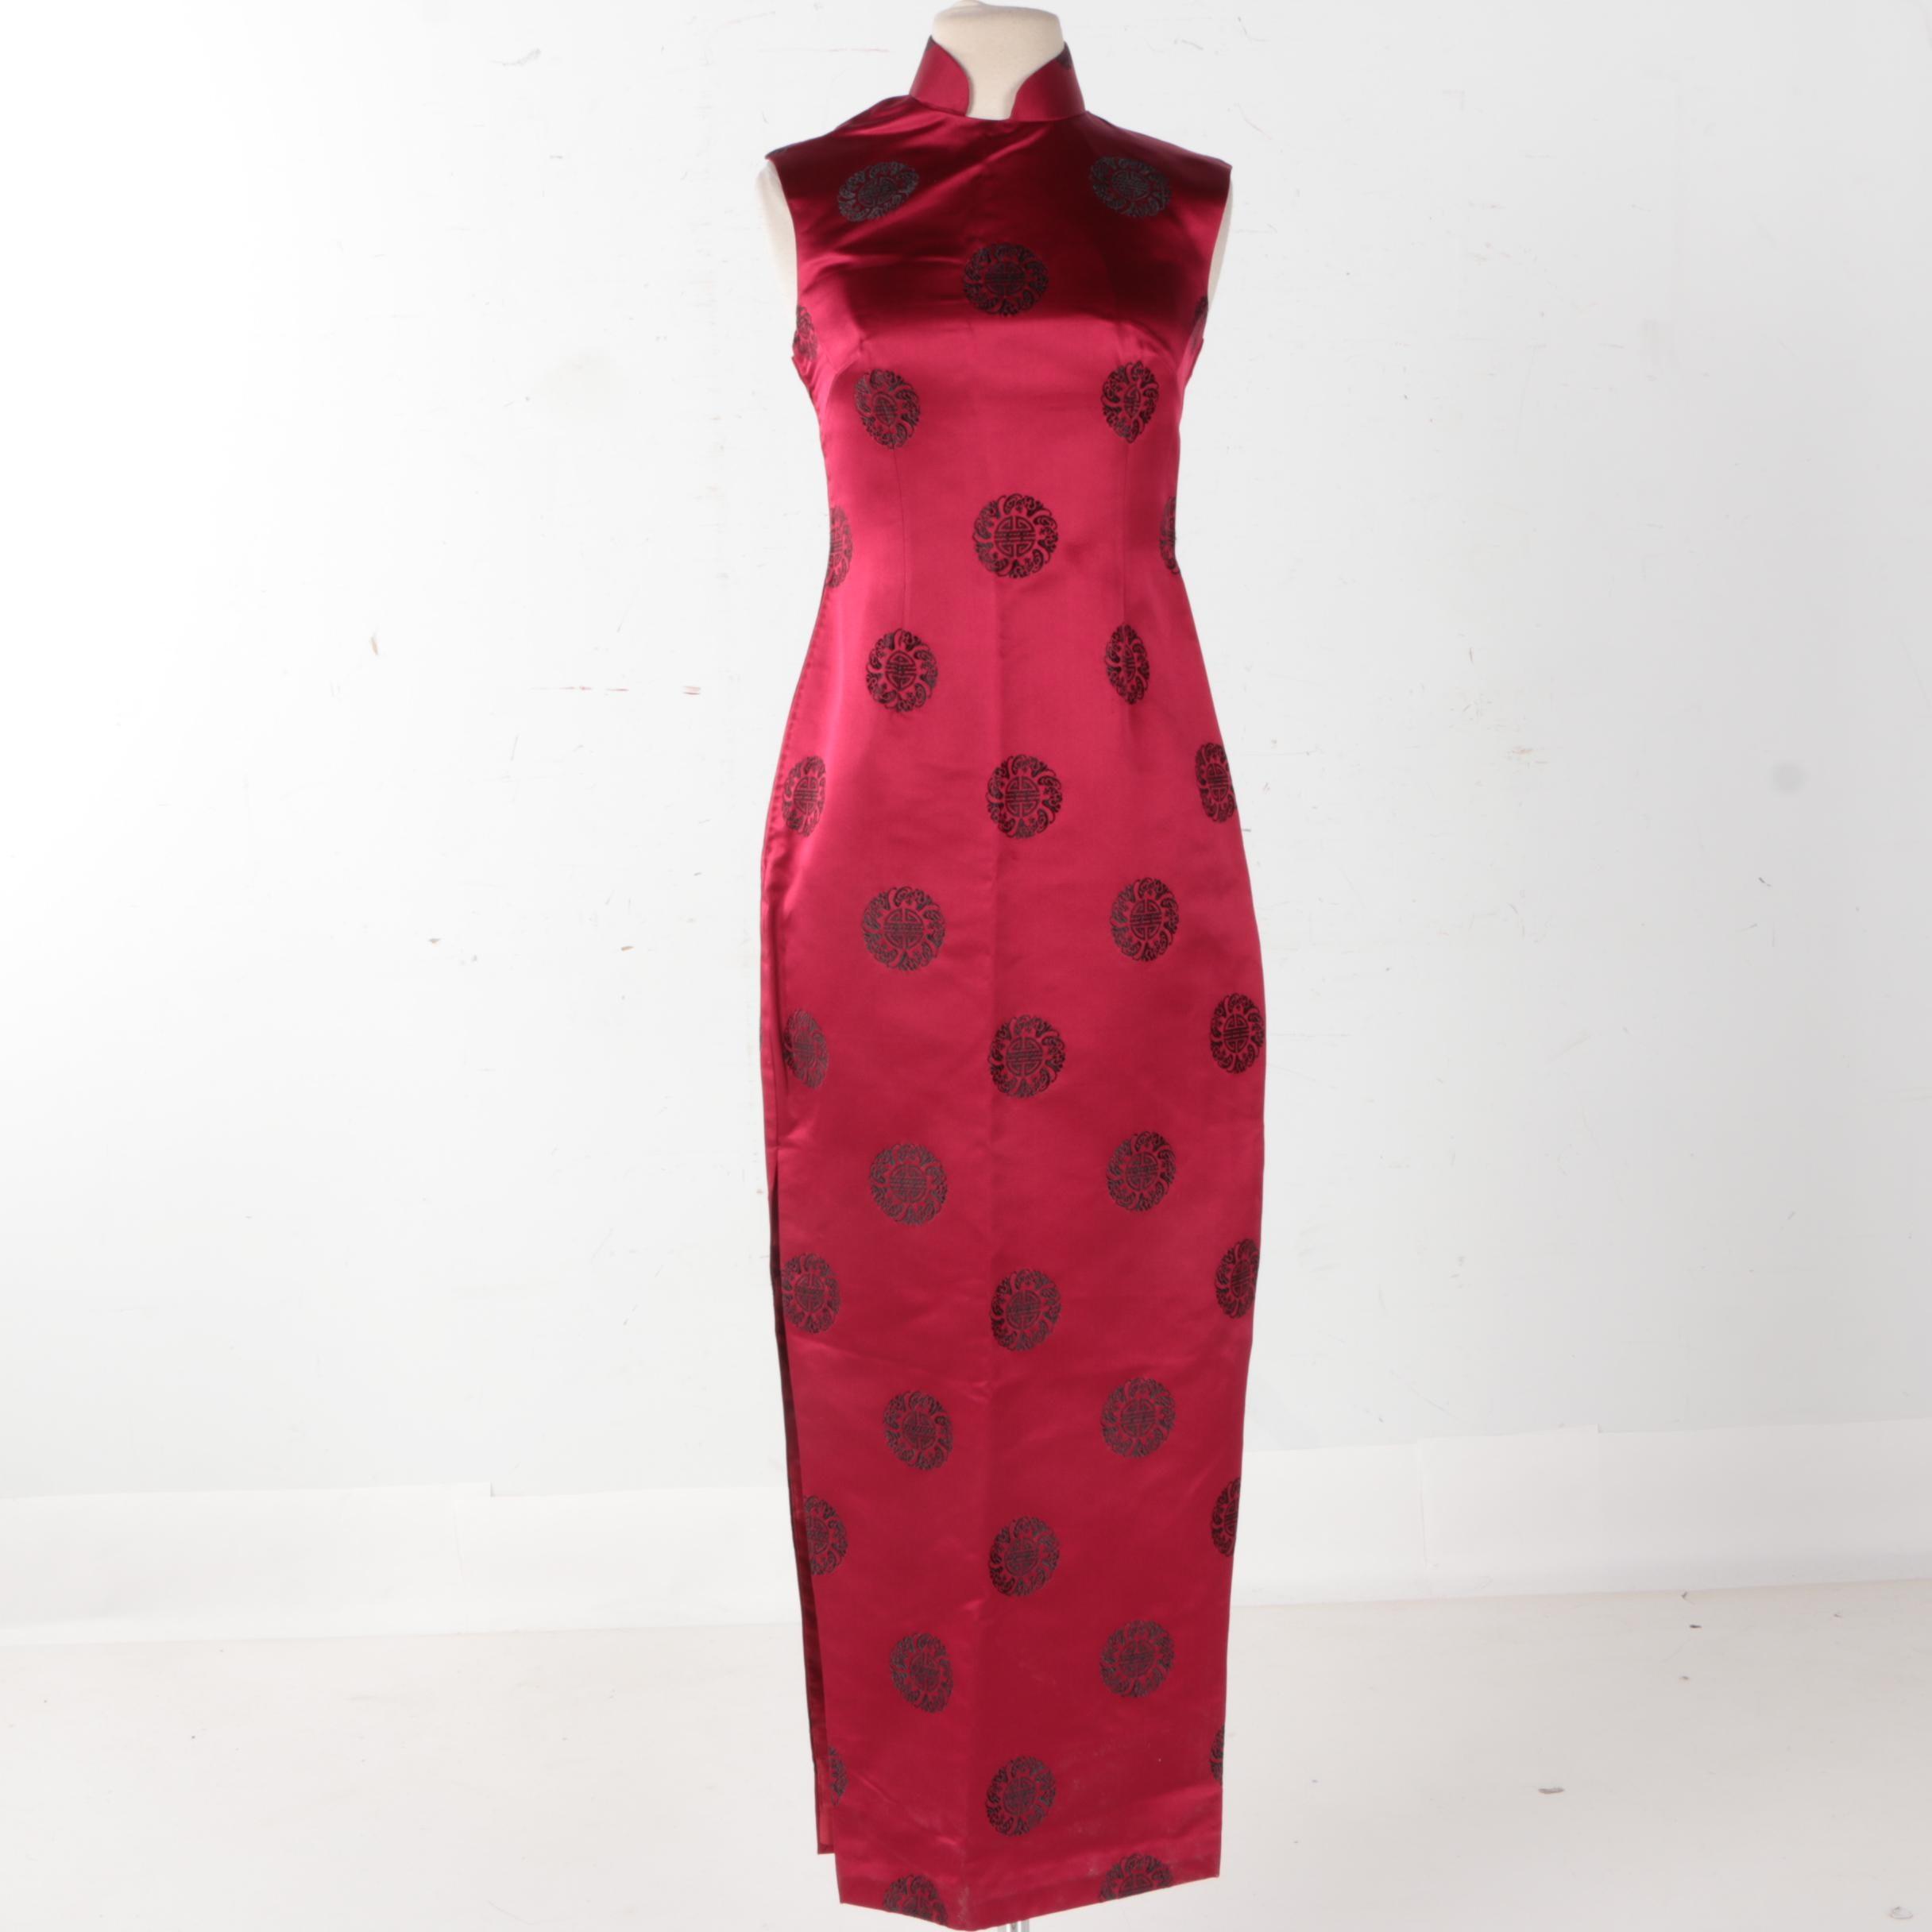 Chinese Inspired Red Silk Dress